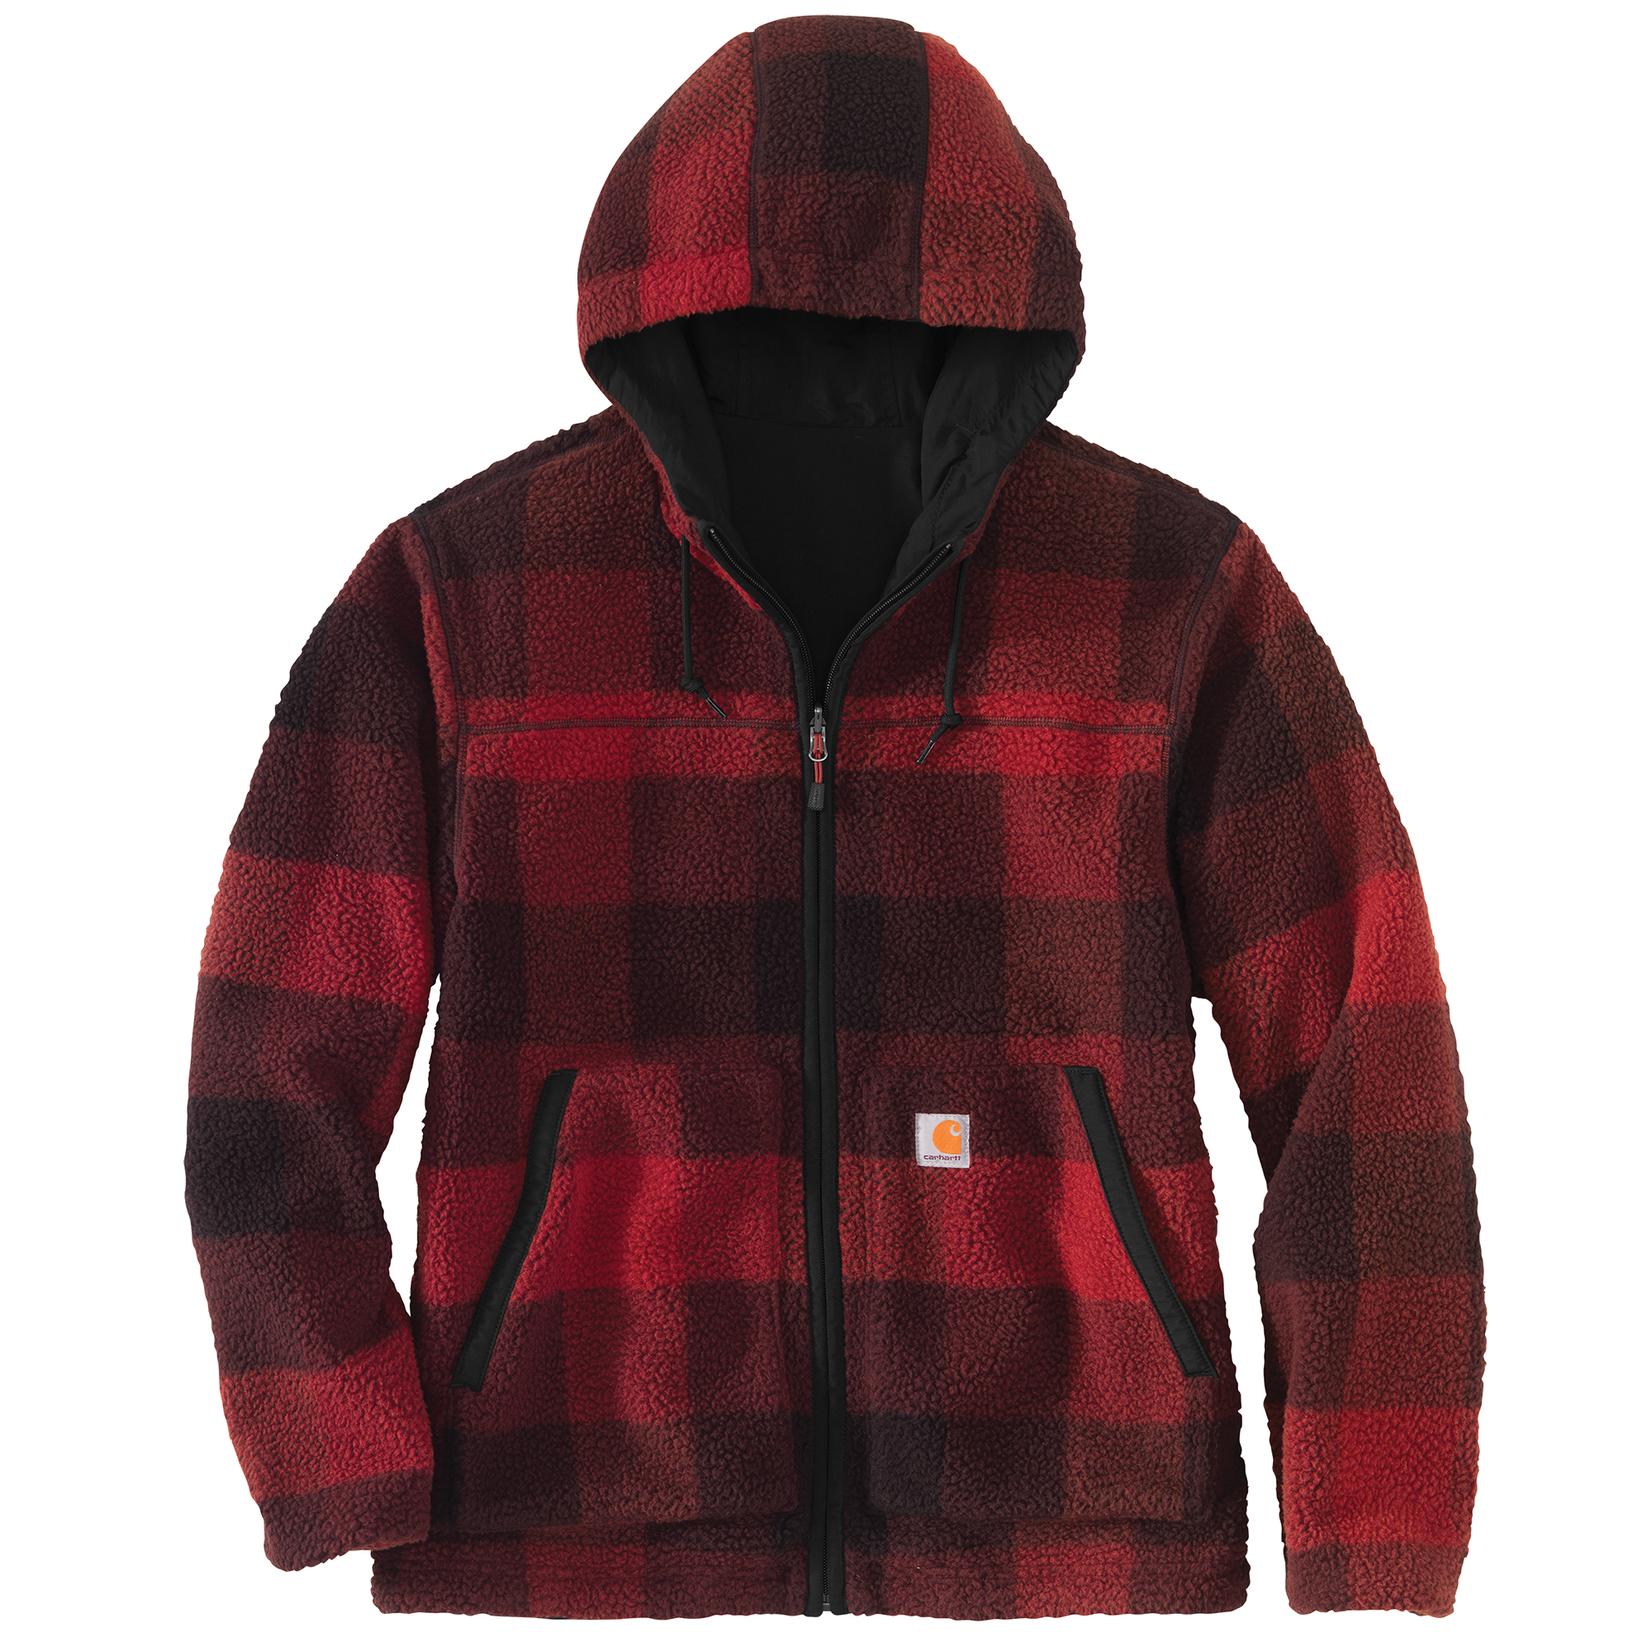 Carhartt Carhartt 104992 Rain Defender Relaxed Fit Fleece Reversible Jacket - R55 Oxblood Plaid/ Black